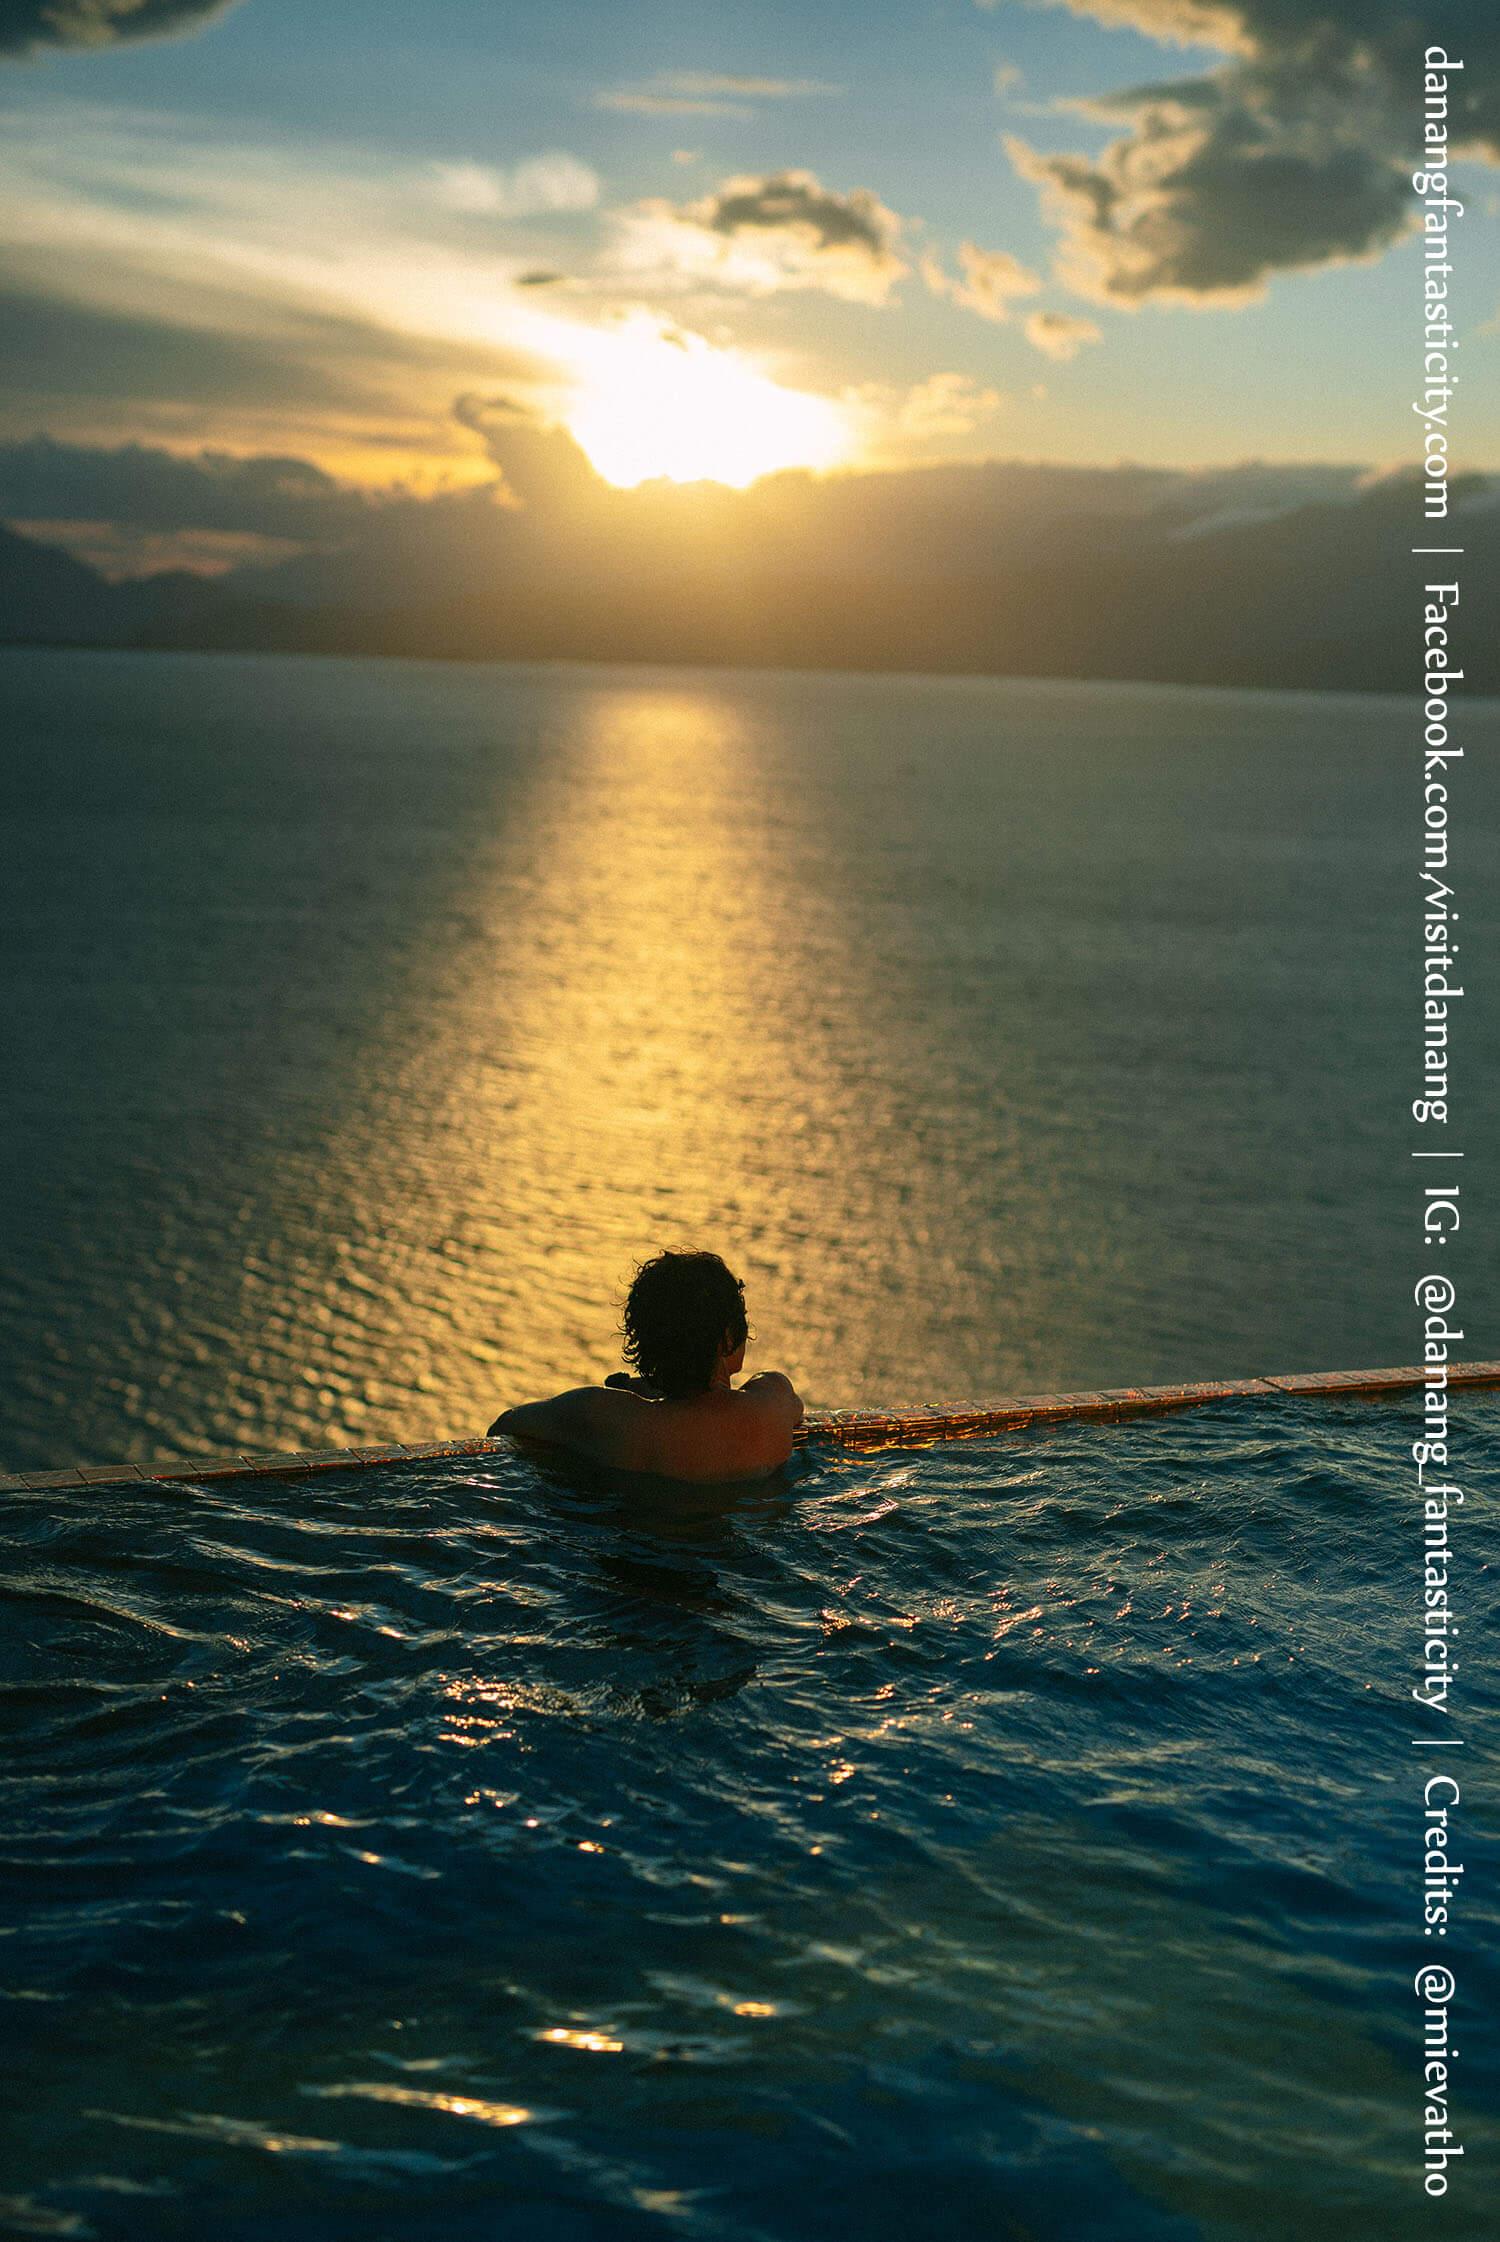 Danang Golden Bay Hoang Hon Vang Cua Da Nang Fantasticity Com 08